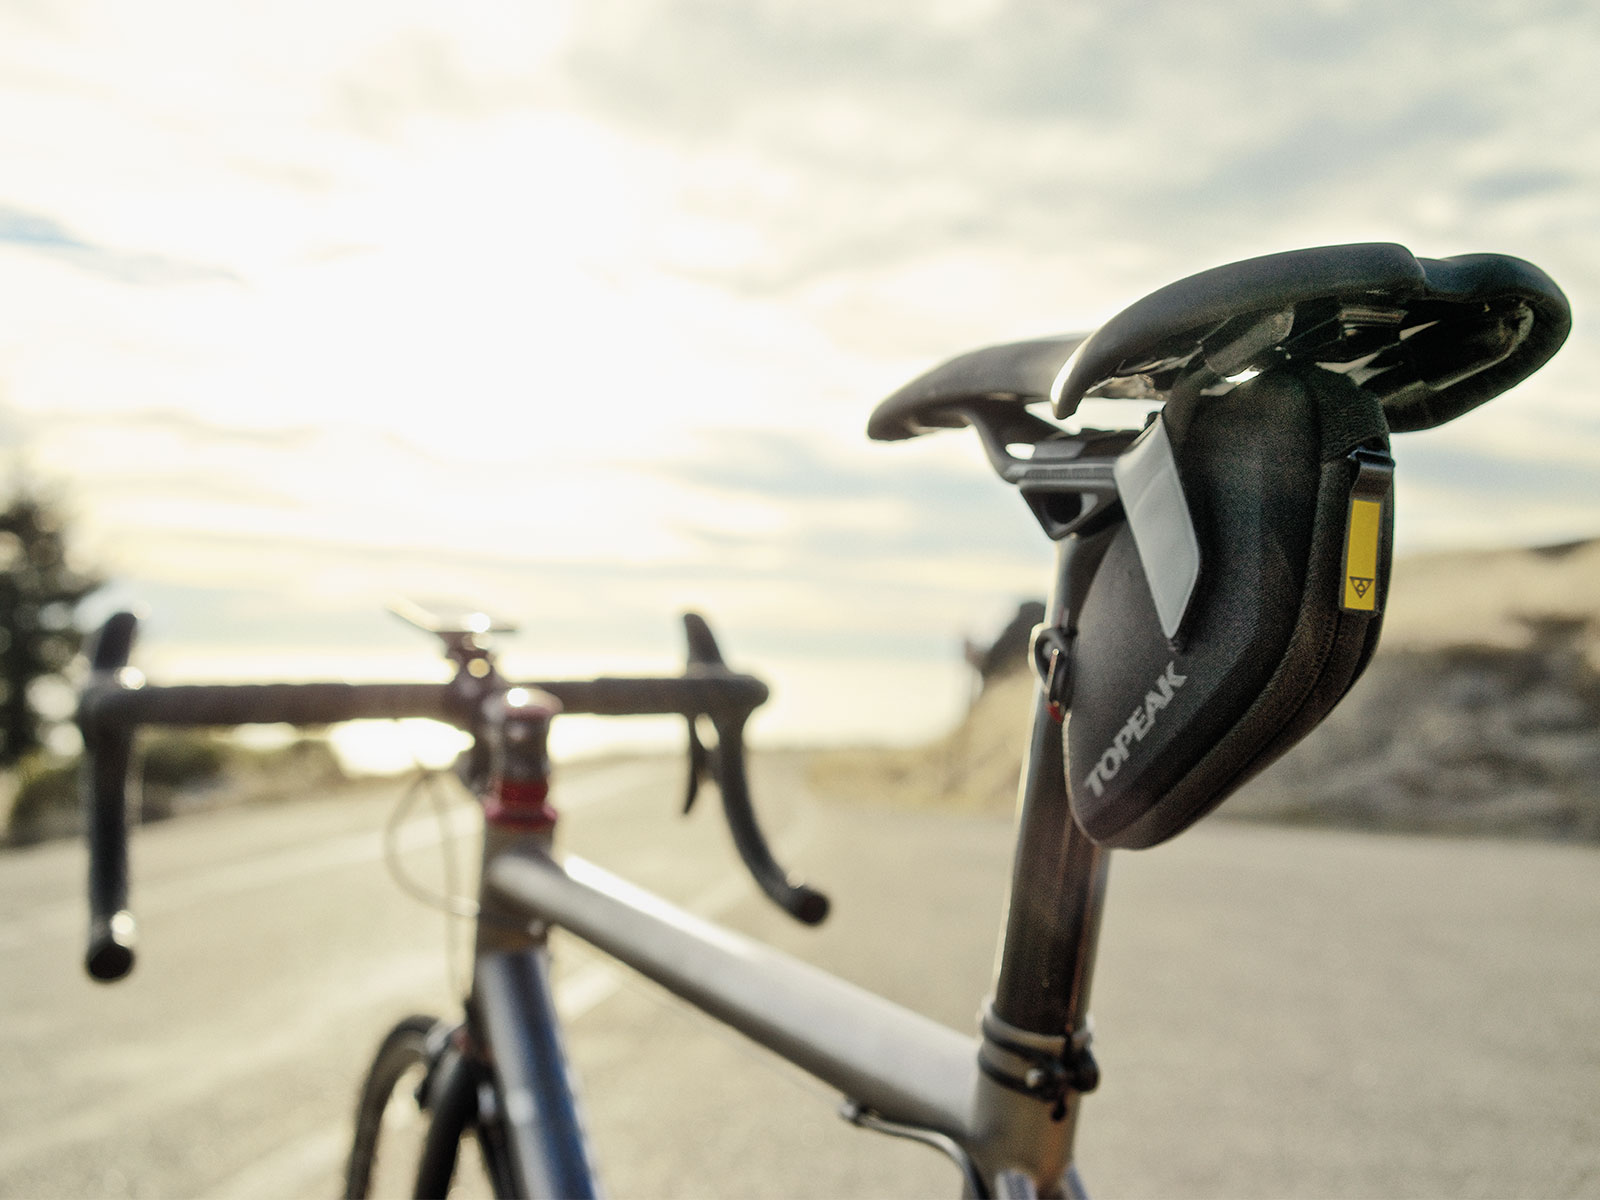 TOPEAK Aero Wedge Bicycle Seat Bag Overview - YouTube